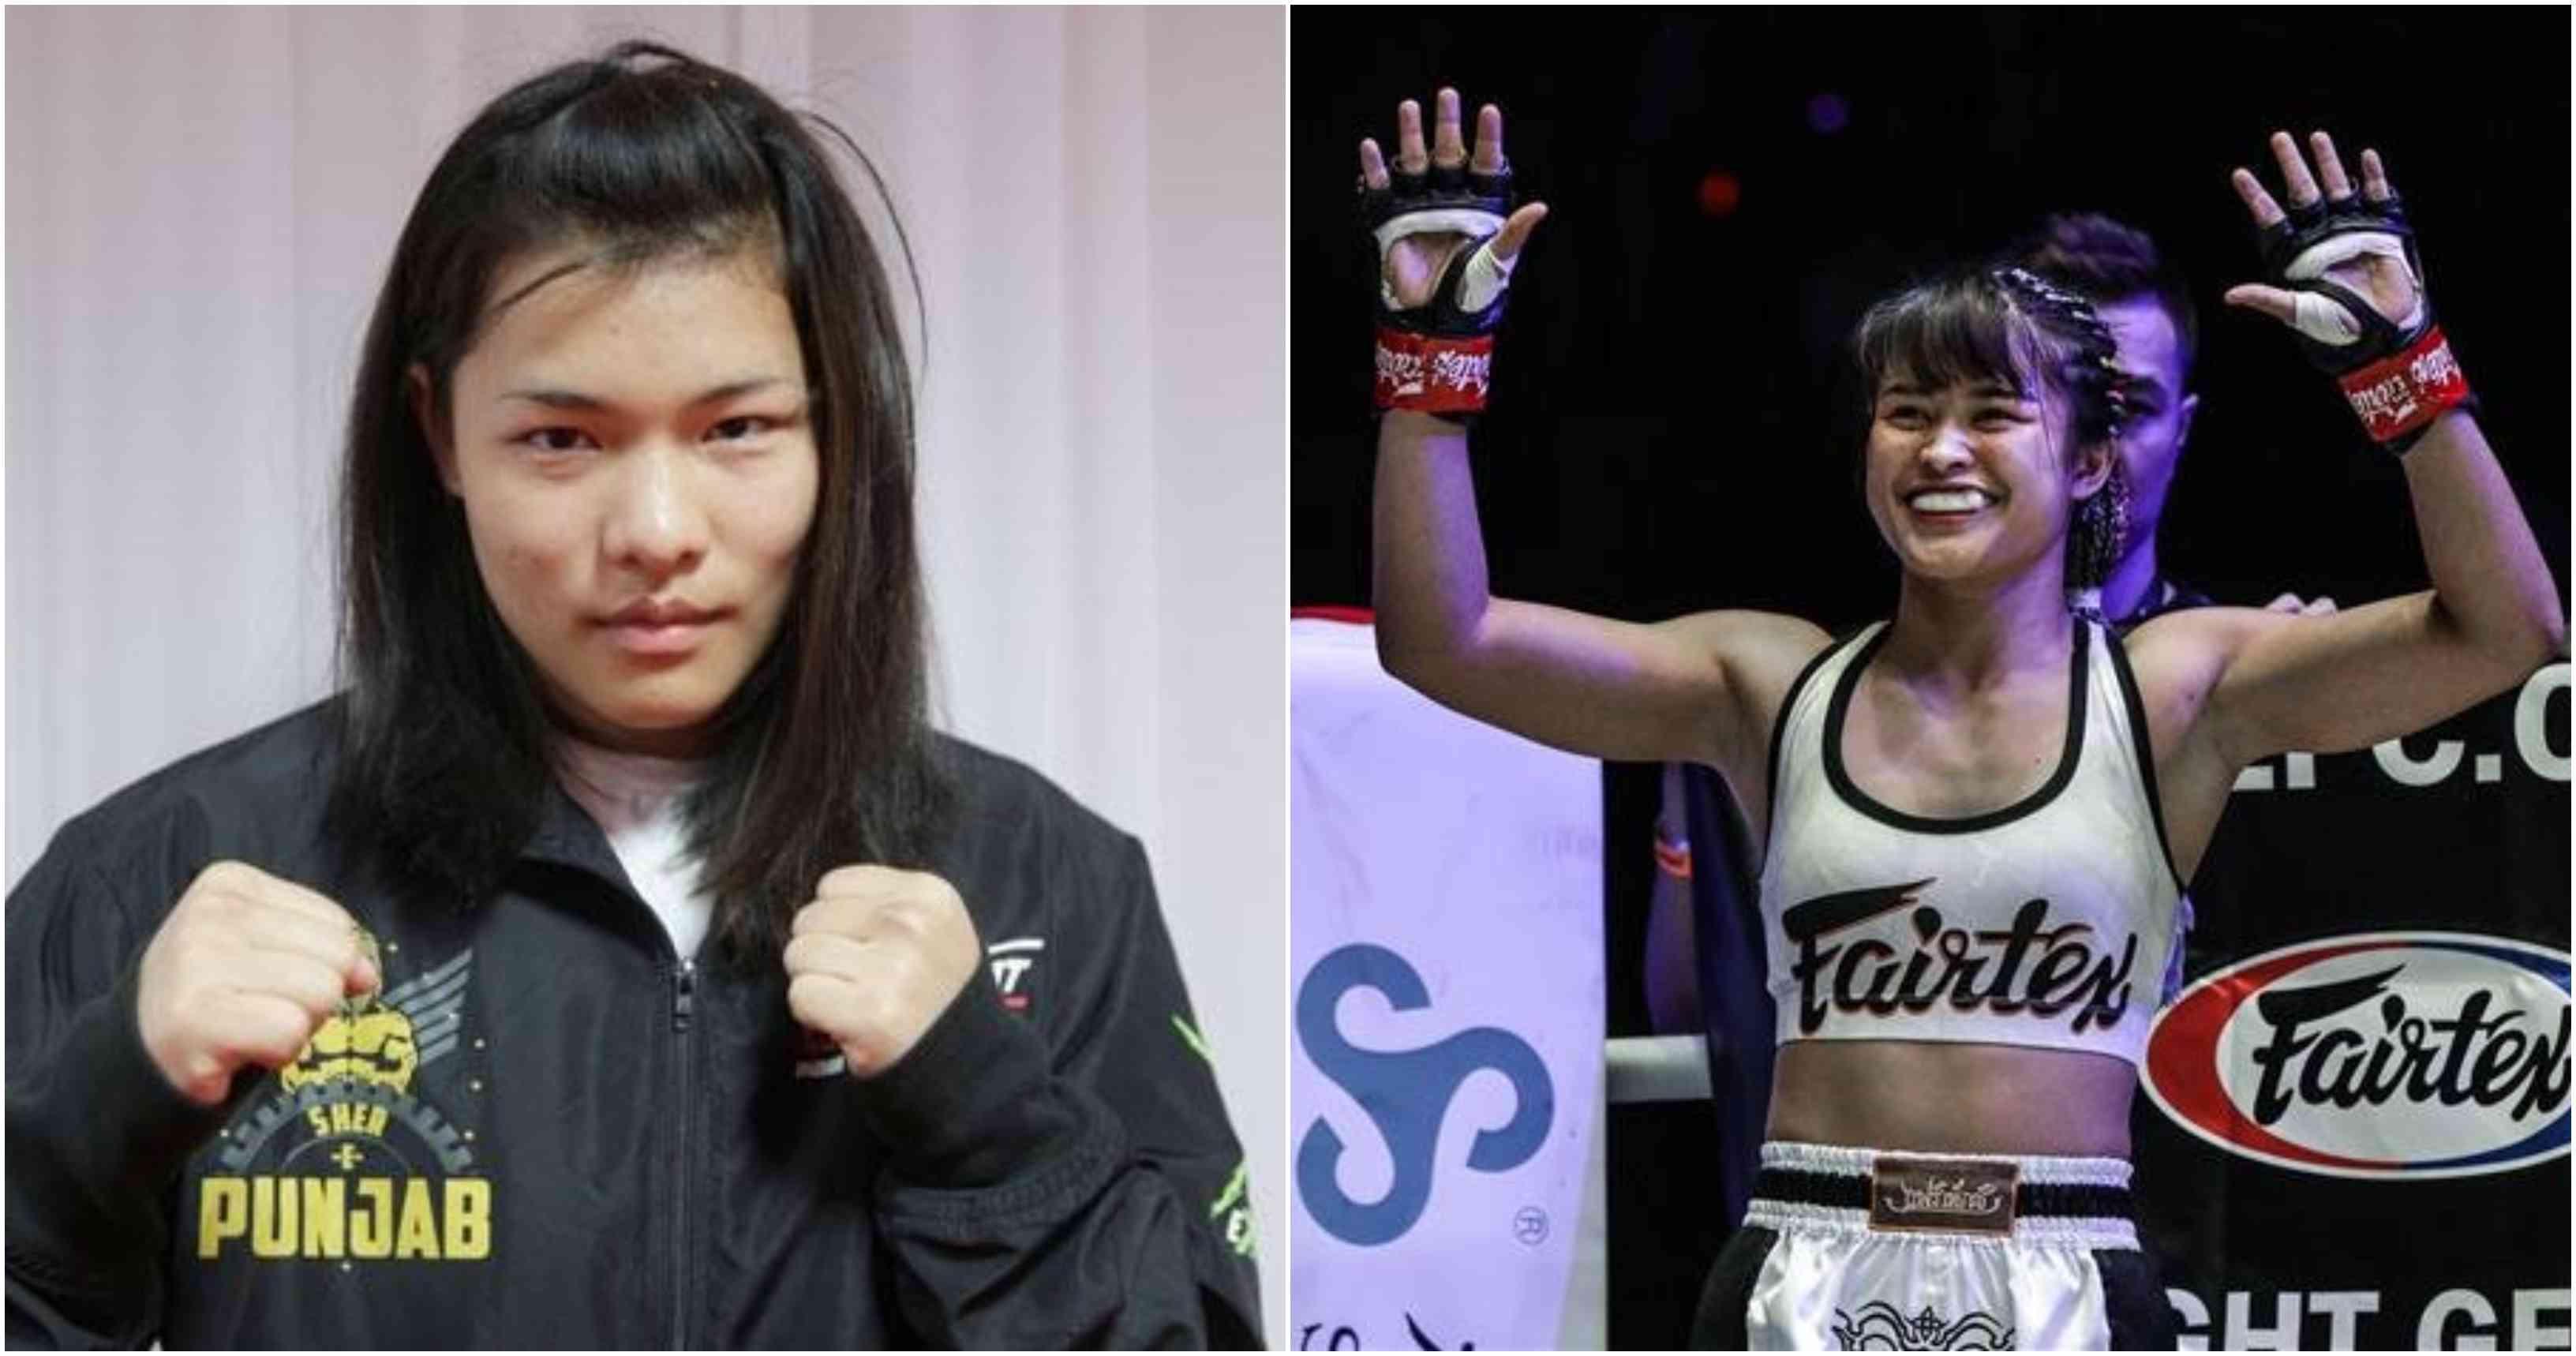 Asha Roka to fight at ONE against Stamp Fairtex in Bangkok on August 16 - Asha